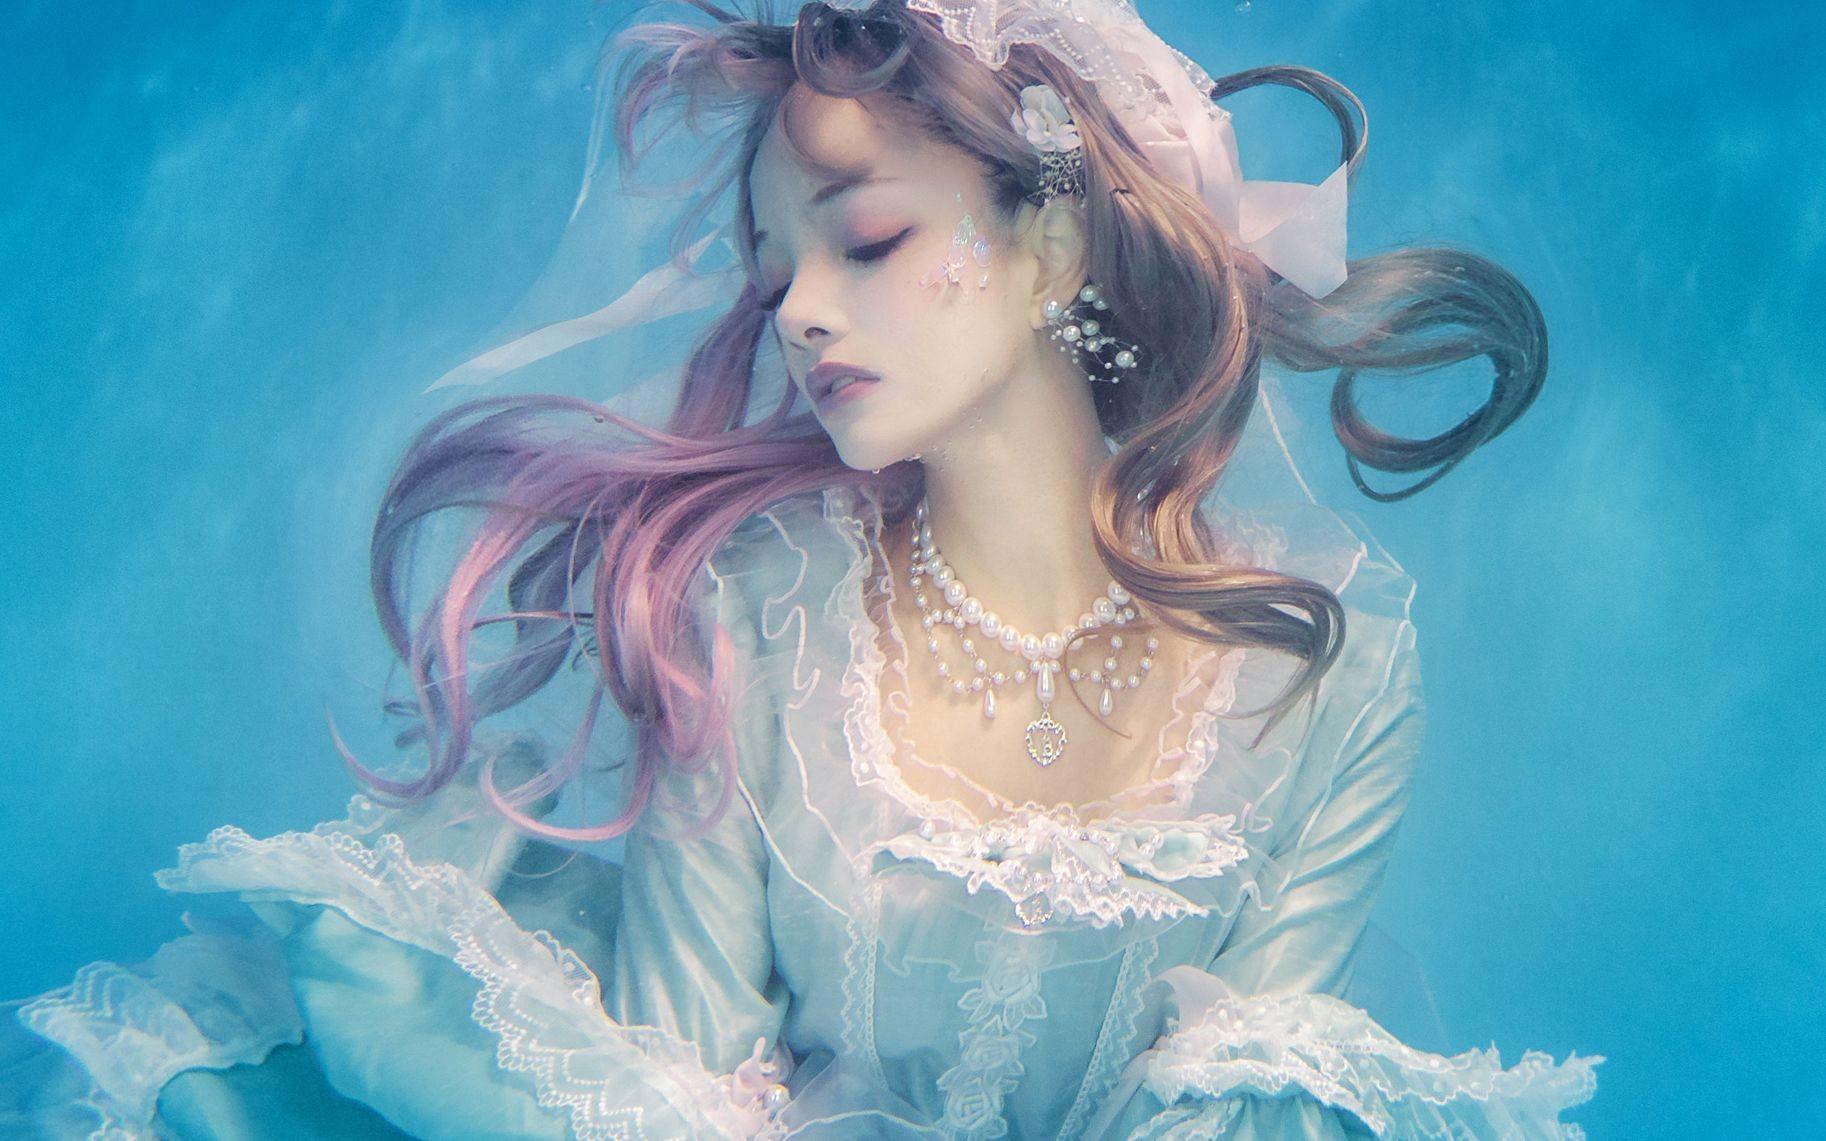 【Lolita】国内那些lo娘有多美你知道吗?(一见倾心系列)